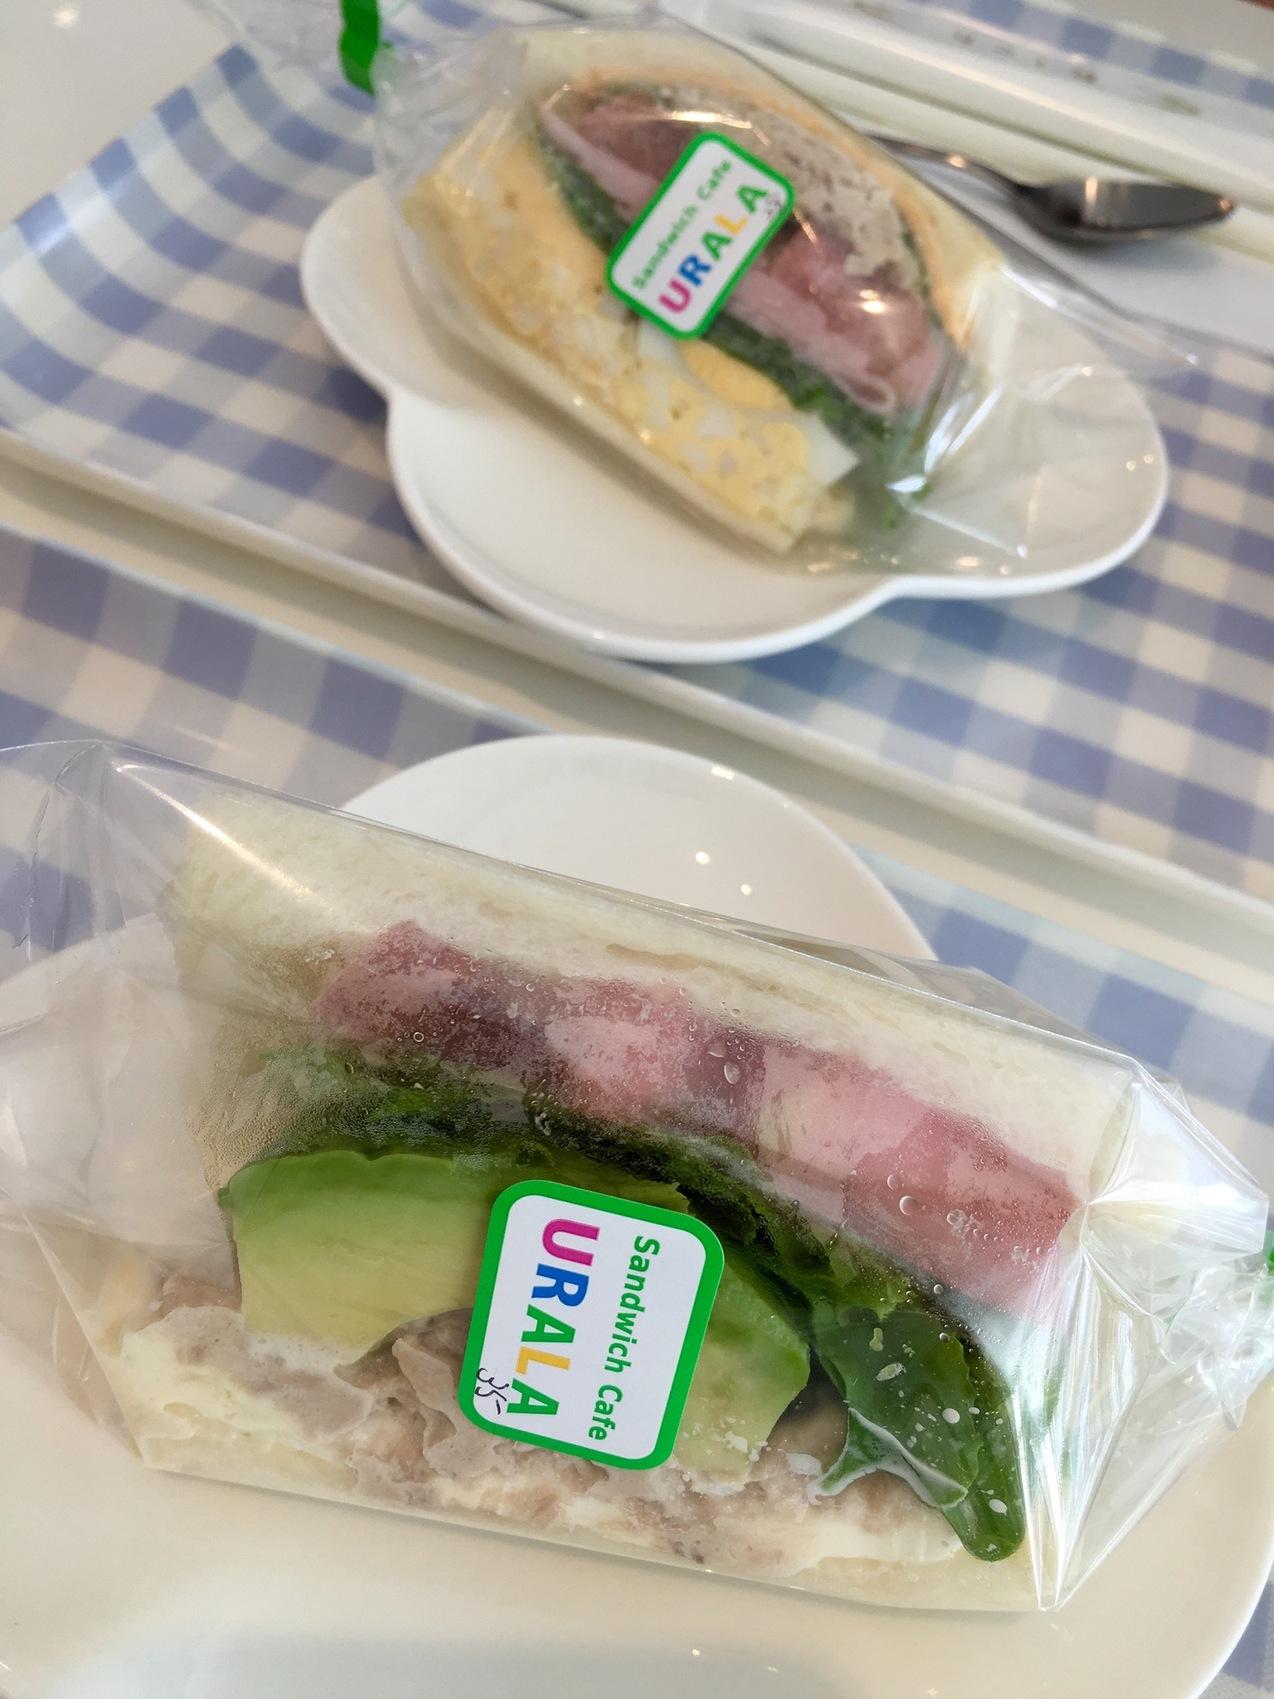 �T���h�C�b�`���X / Sandwich Cafe URALA